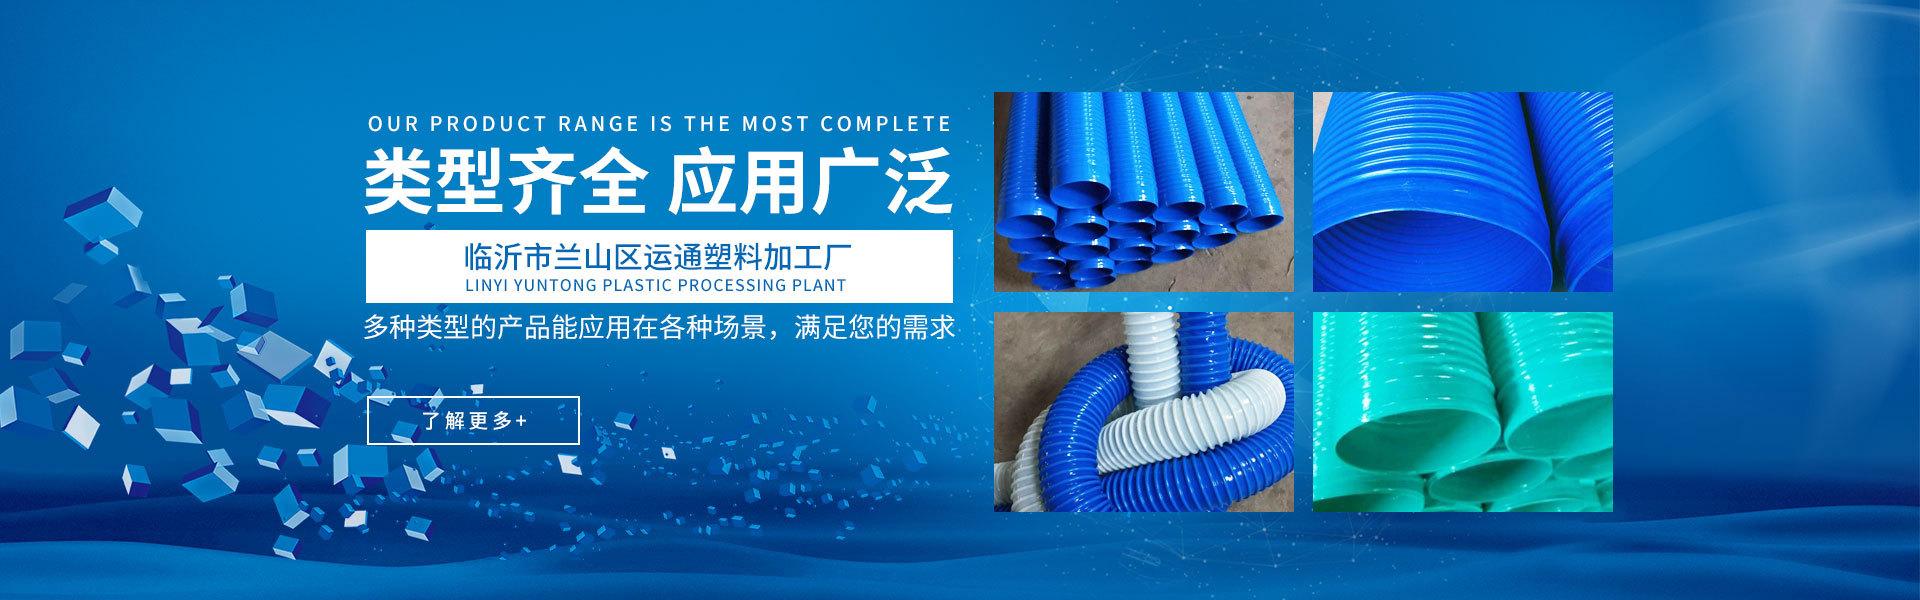 PVC通风管,PVC螺旋管,吸尘软管厂家,PVC除尘管厂家